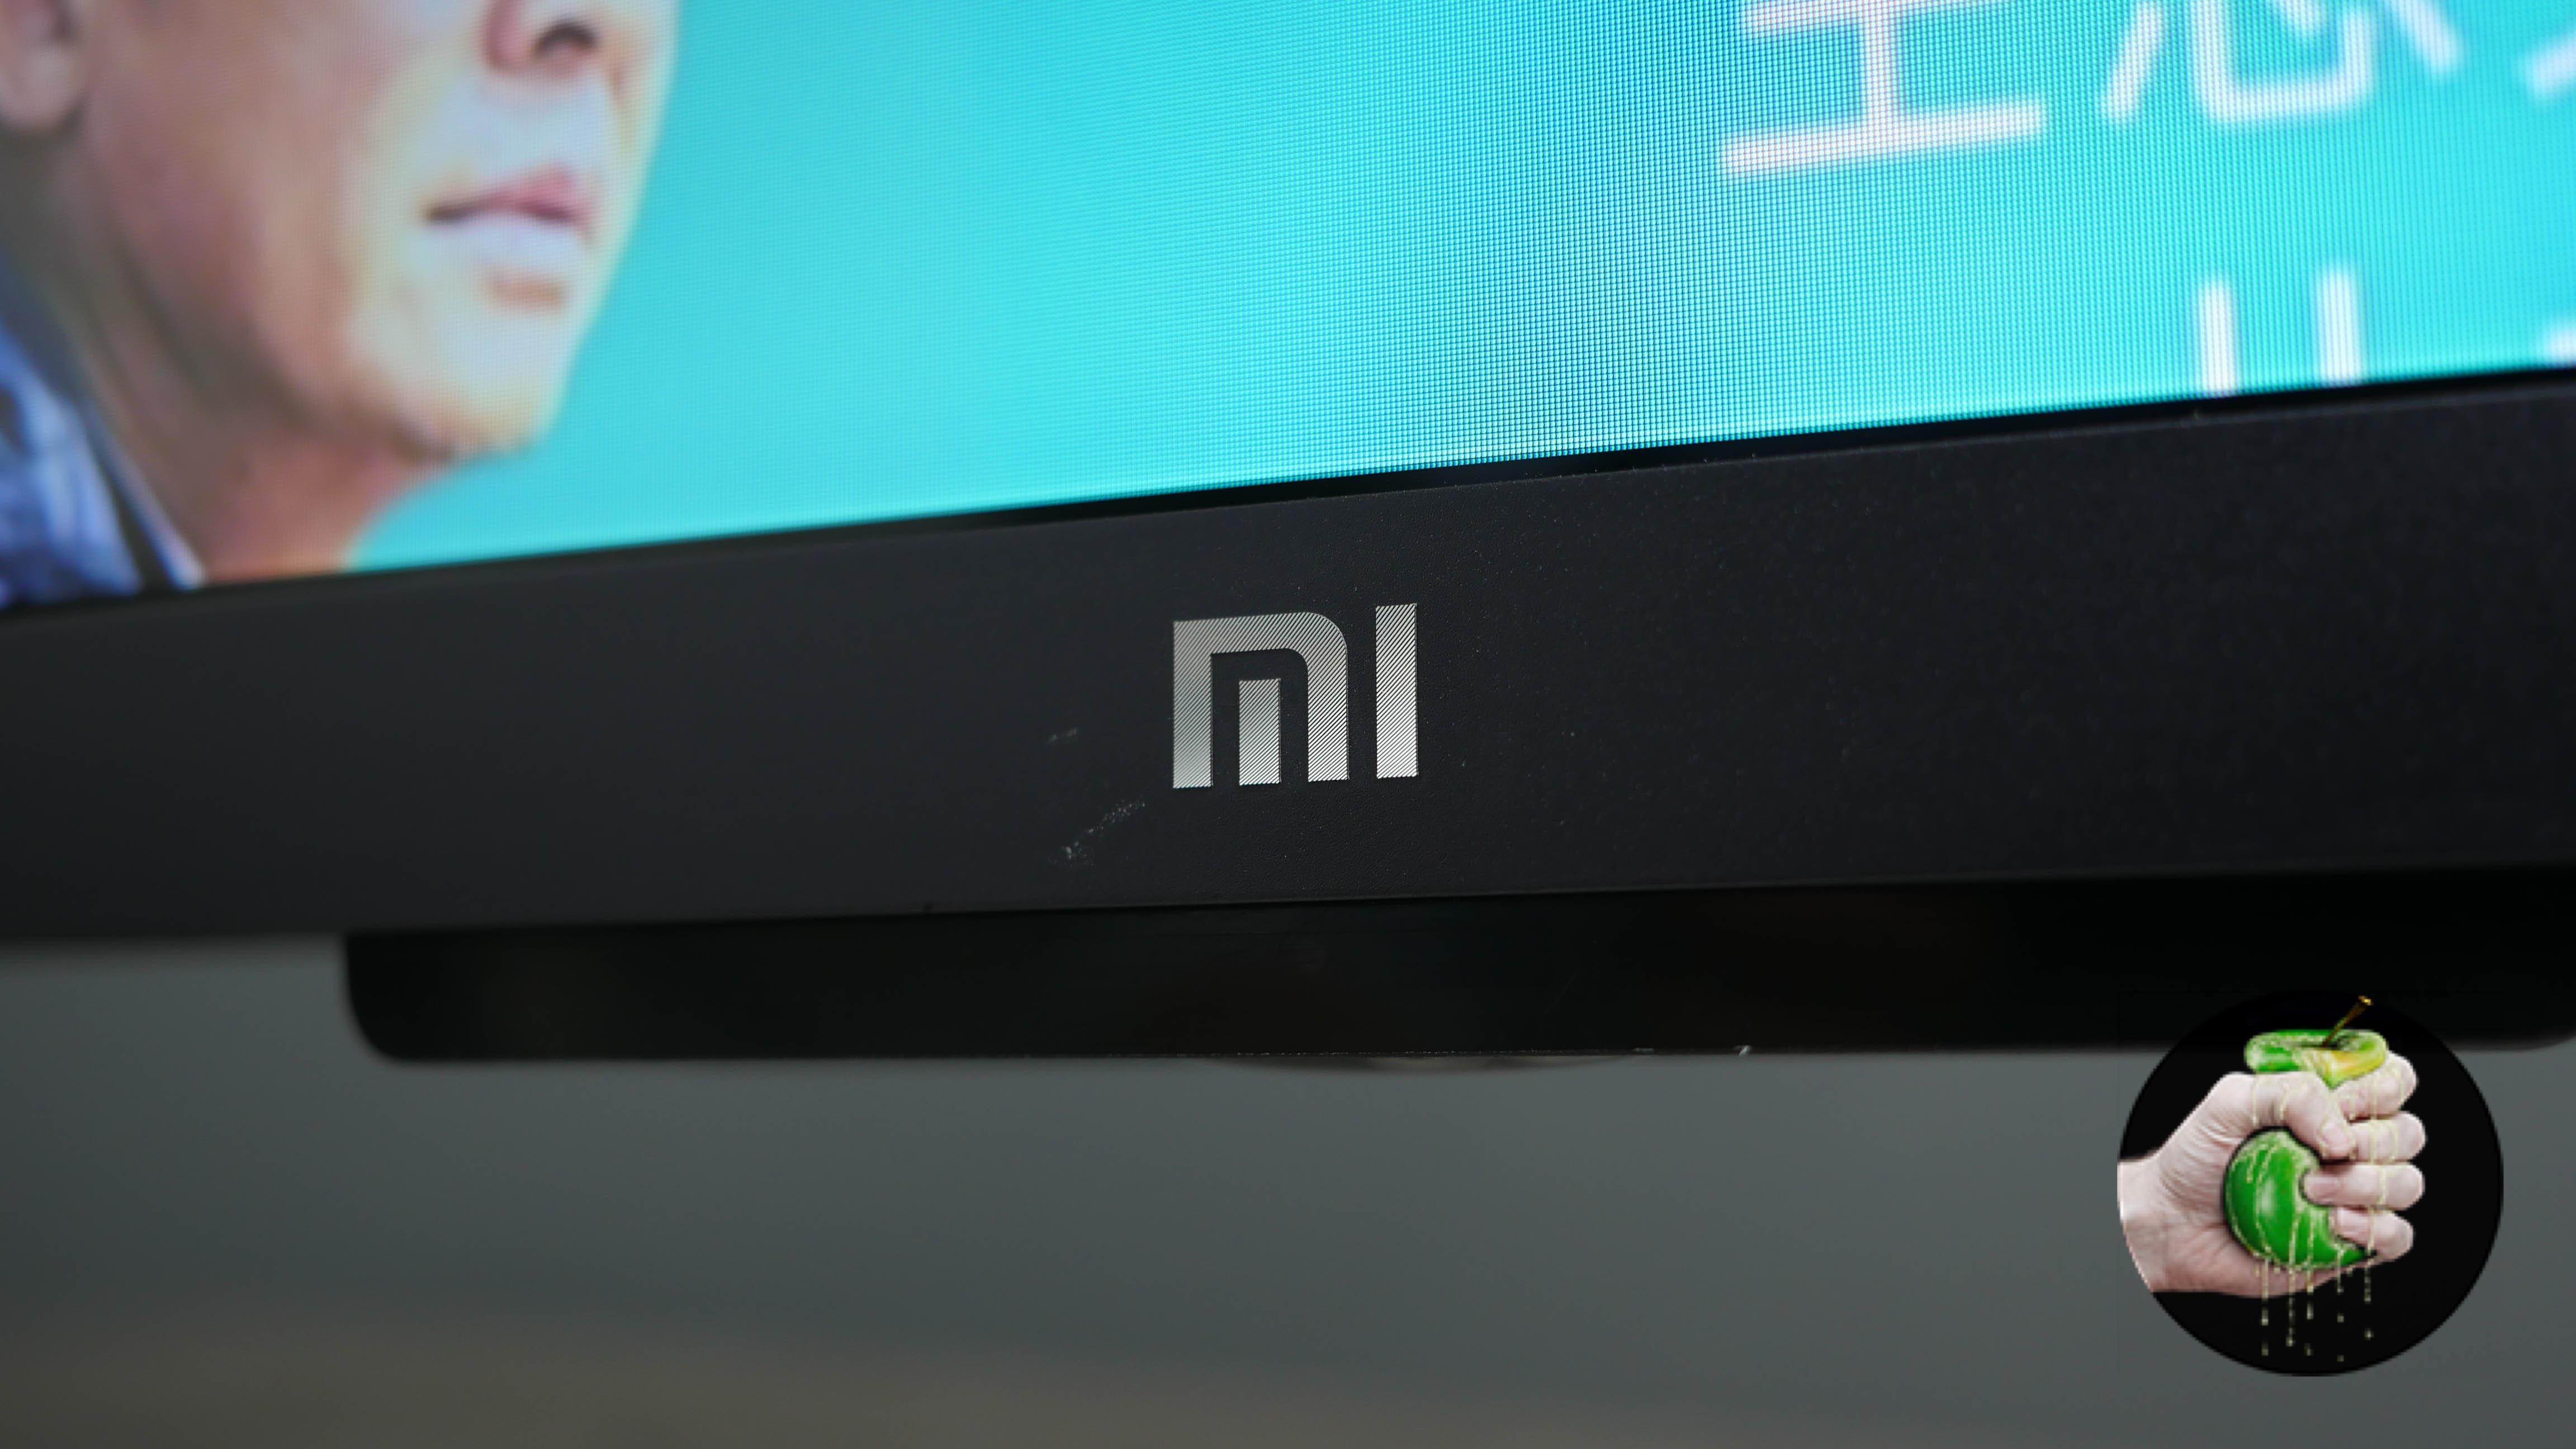 Обзор 4К телевизора Xiaomi c HDR за 00